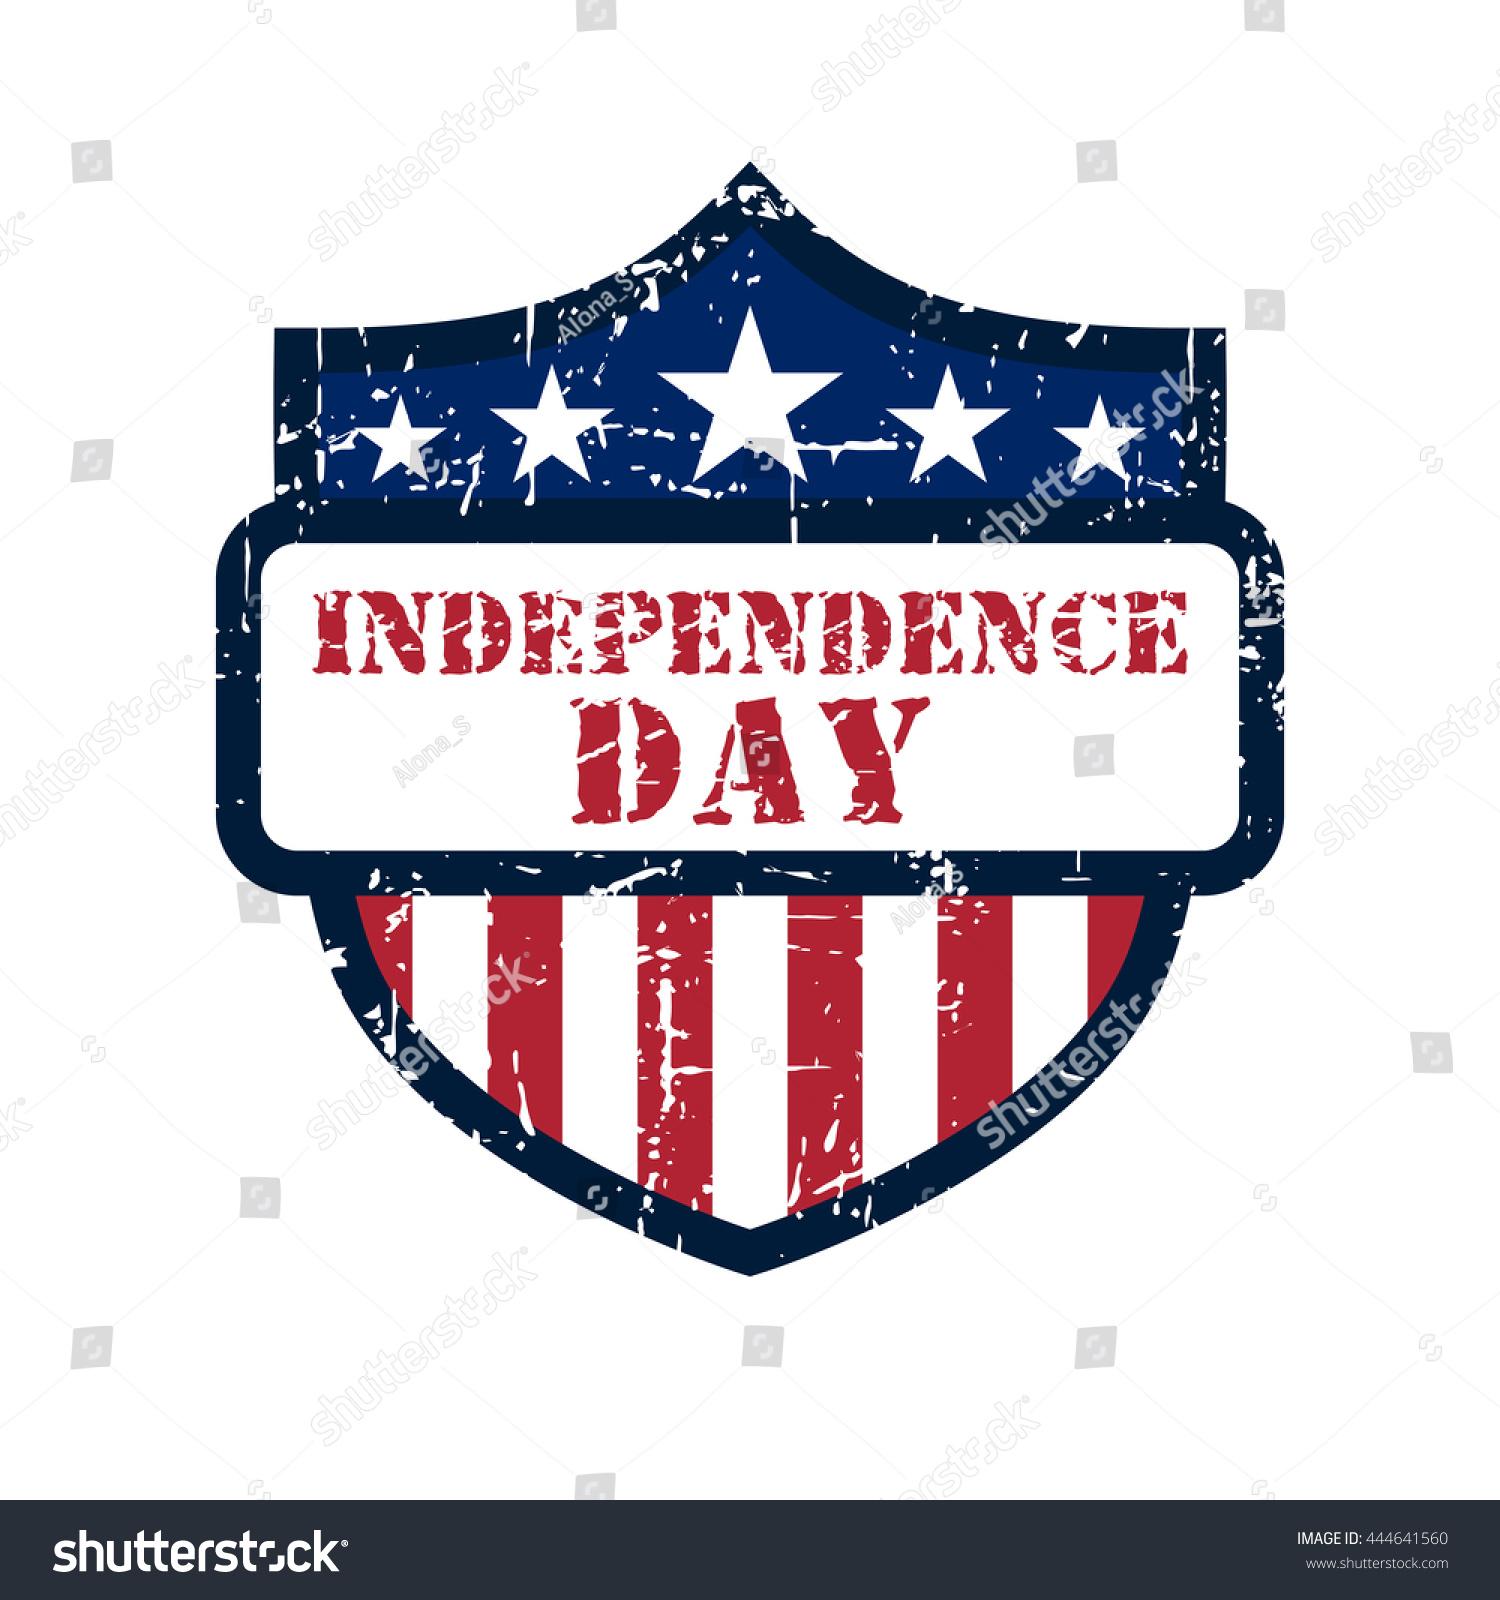 American flag element symbol 4th july stock vector 444641560 american flag element symbol for 4th of july independence day celebration patriotic typography biocorpaavc